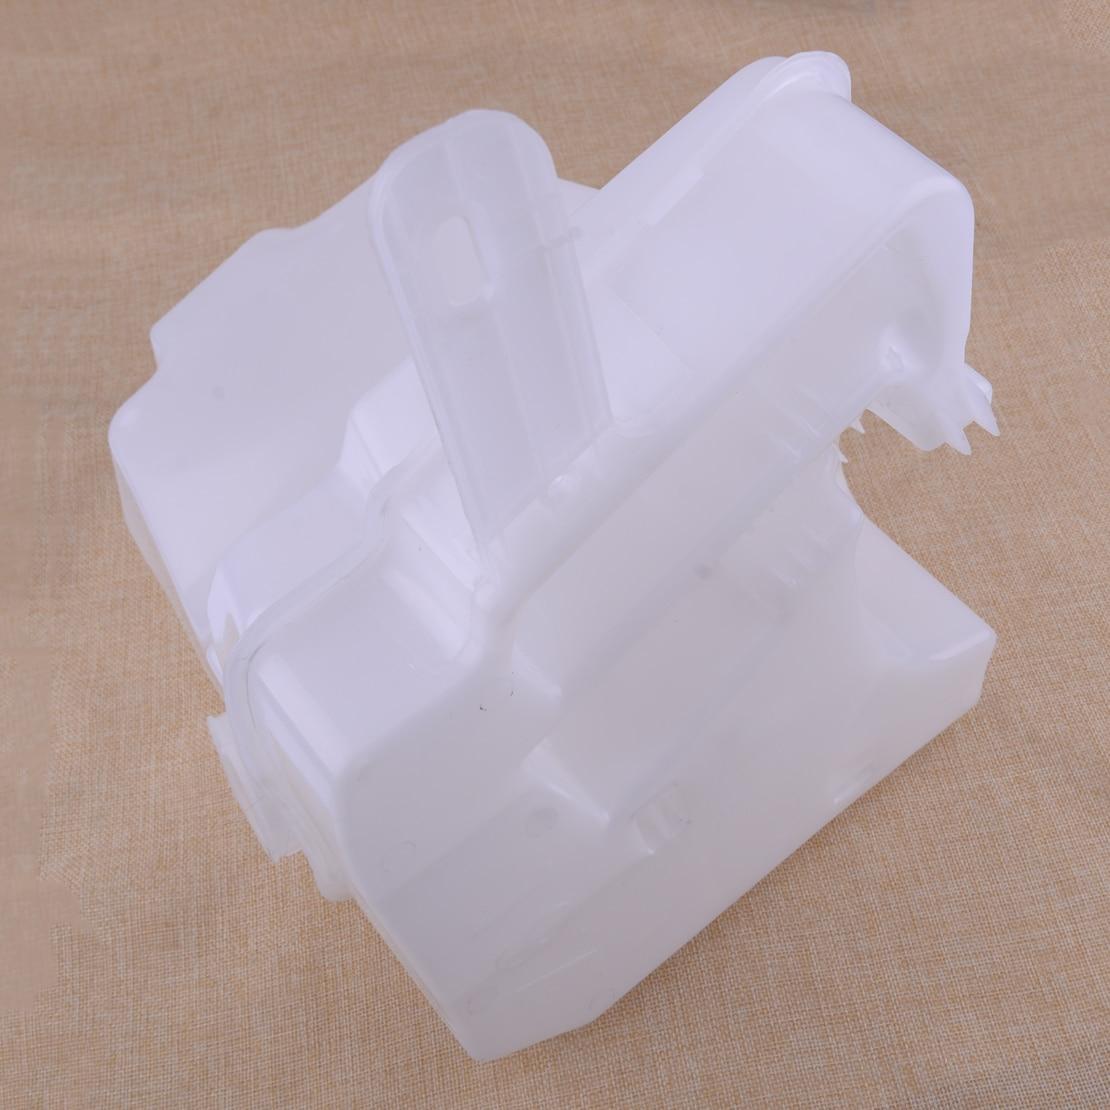 CITALL-خزان سائل غسيل الزجاج الأمامي للسيارة ، بلاستيك 1638690820 ، مناسب لمرسيدس W163 ML320 ML430 ML350 ML500 ML55 AMG